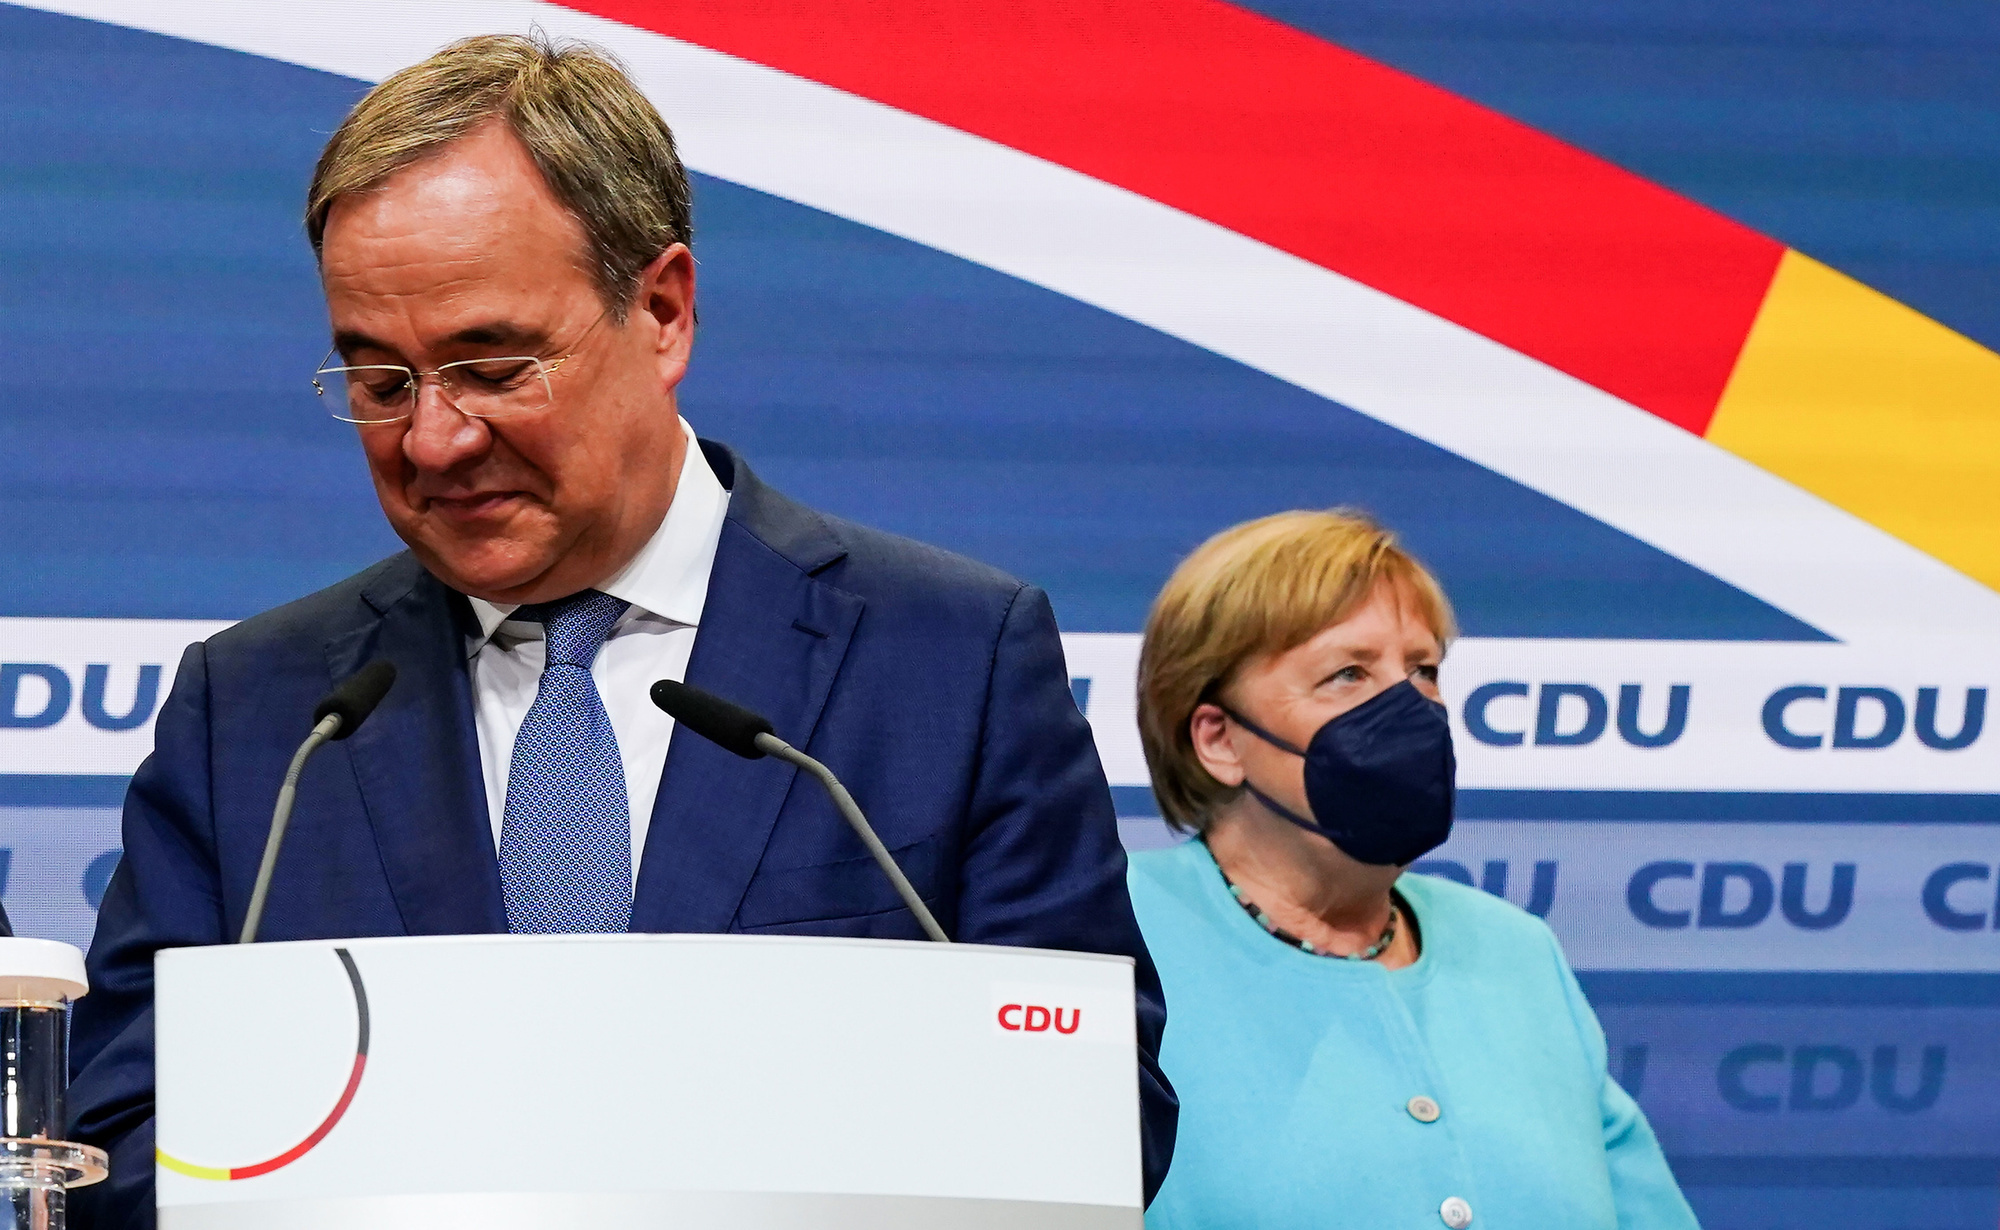 Armin Laschet en Angela Merkel op 26/09/2021